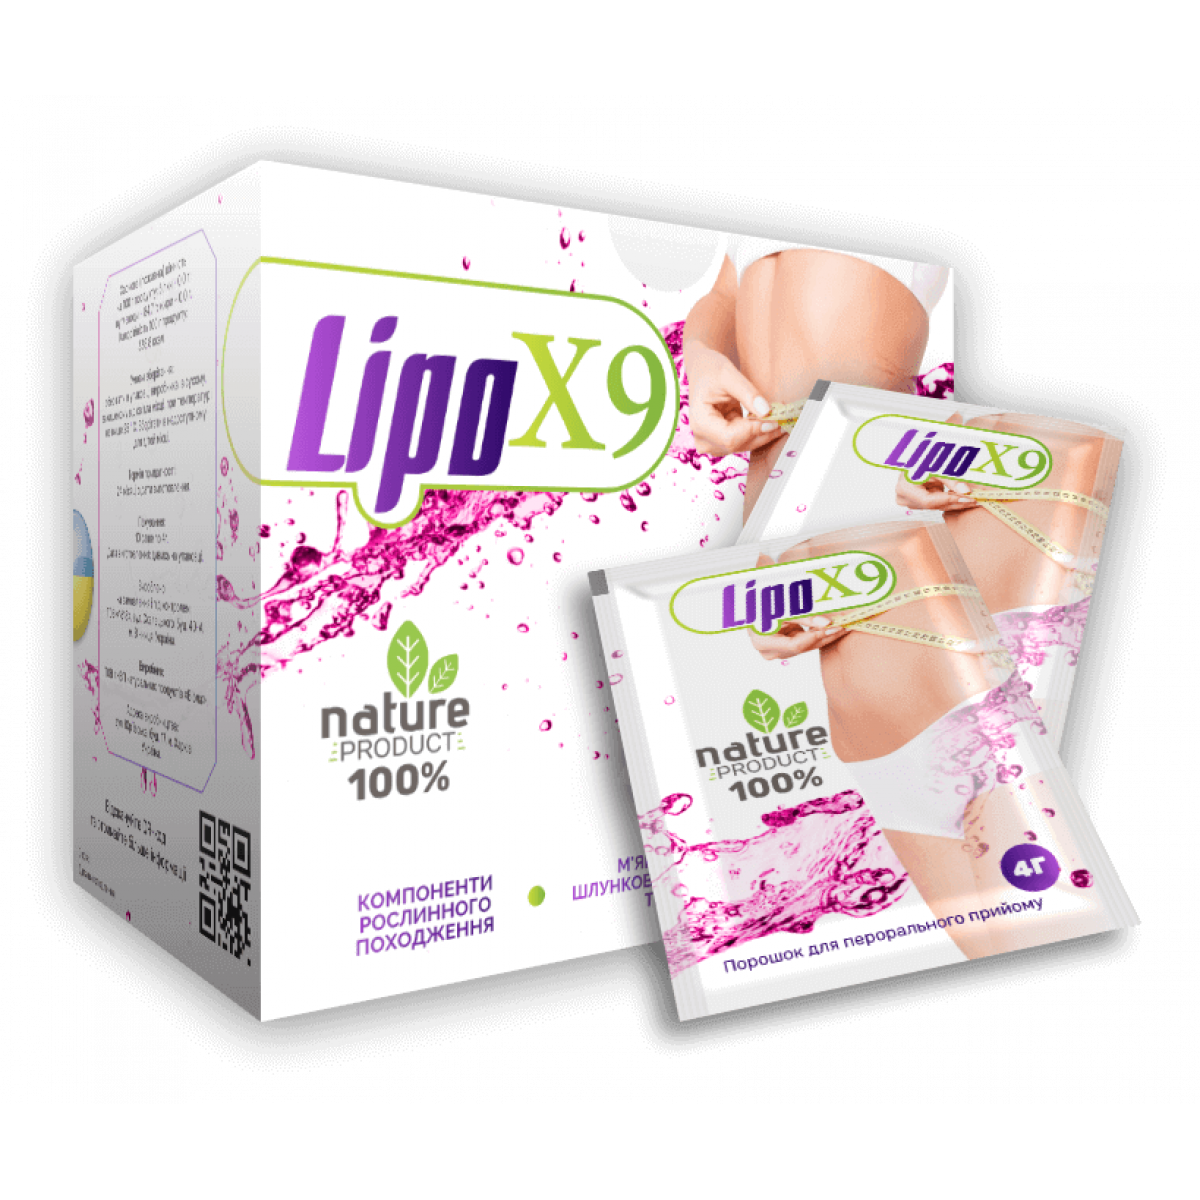 LipoX9 средство для похудения